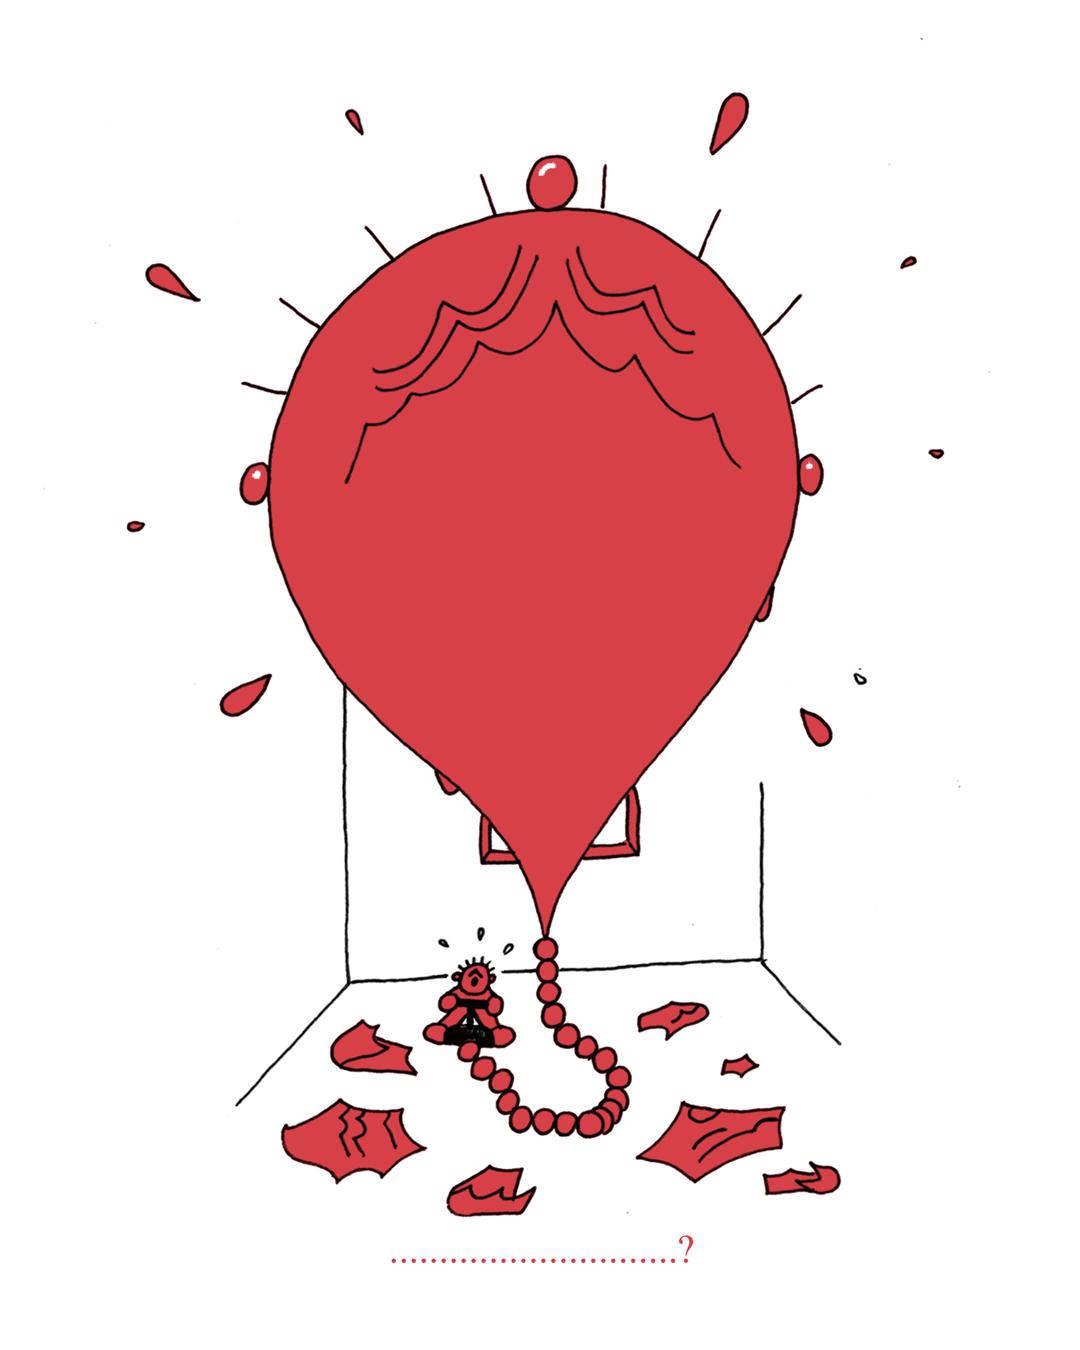 Ego Balloon, personal, 2018